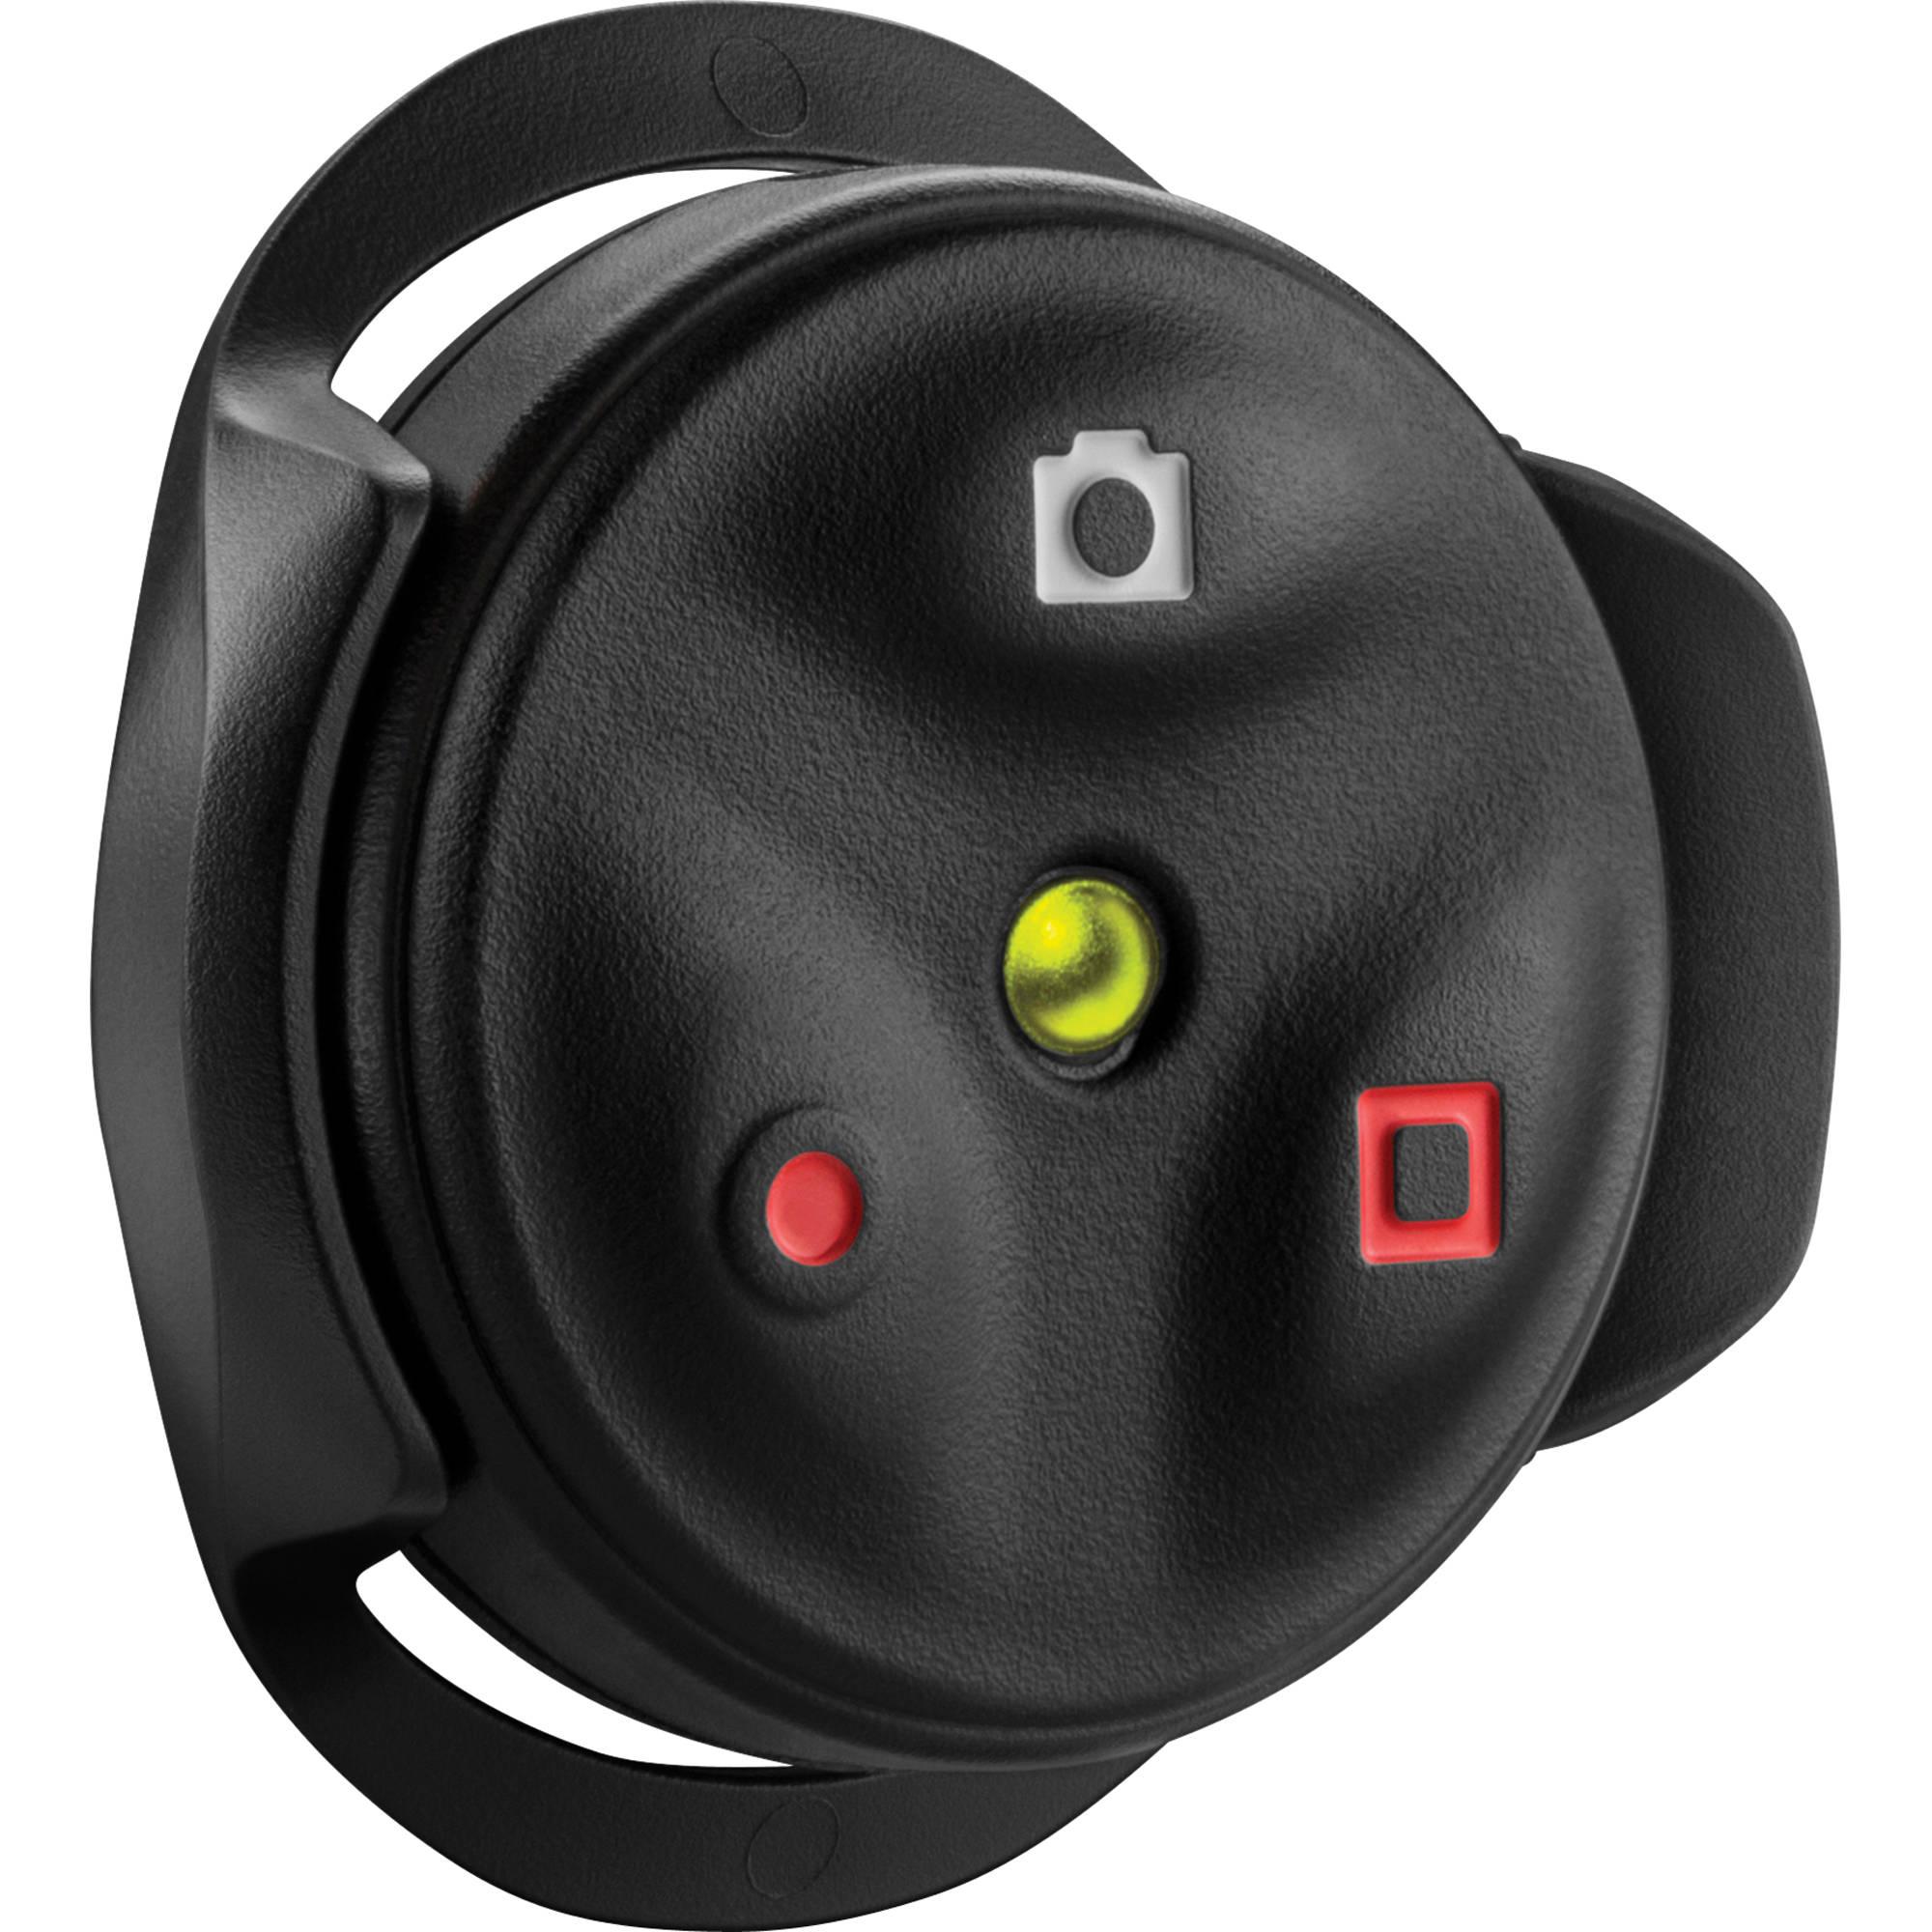 VIRB Remote Control